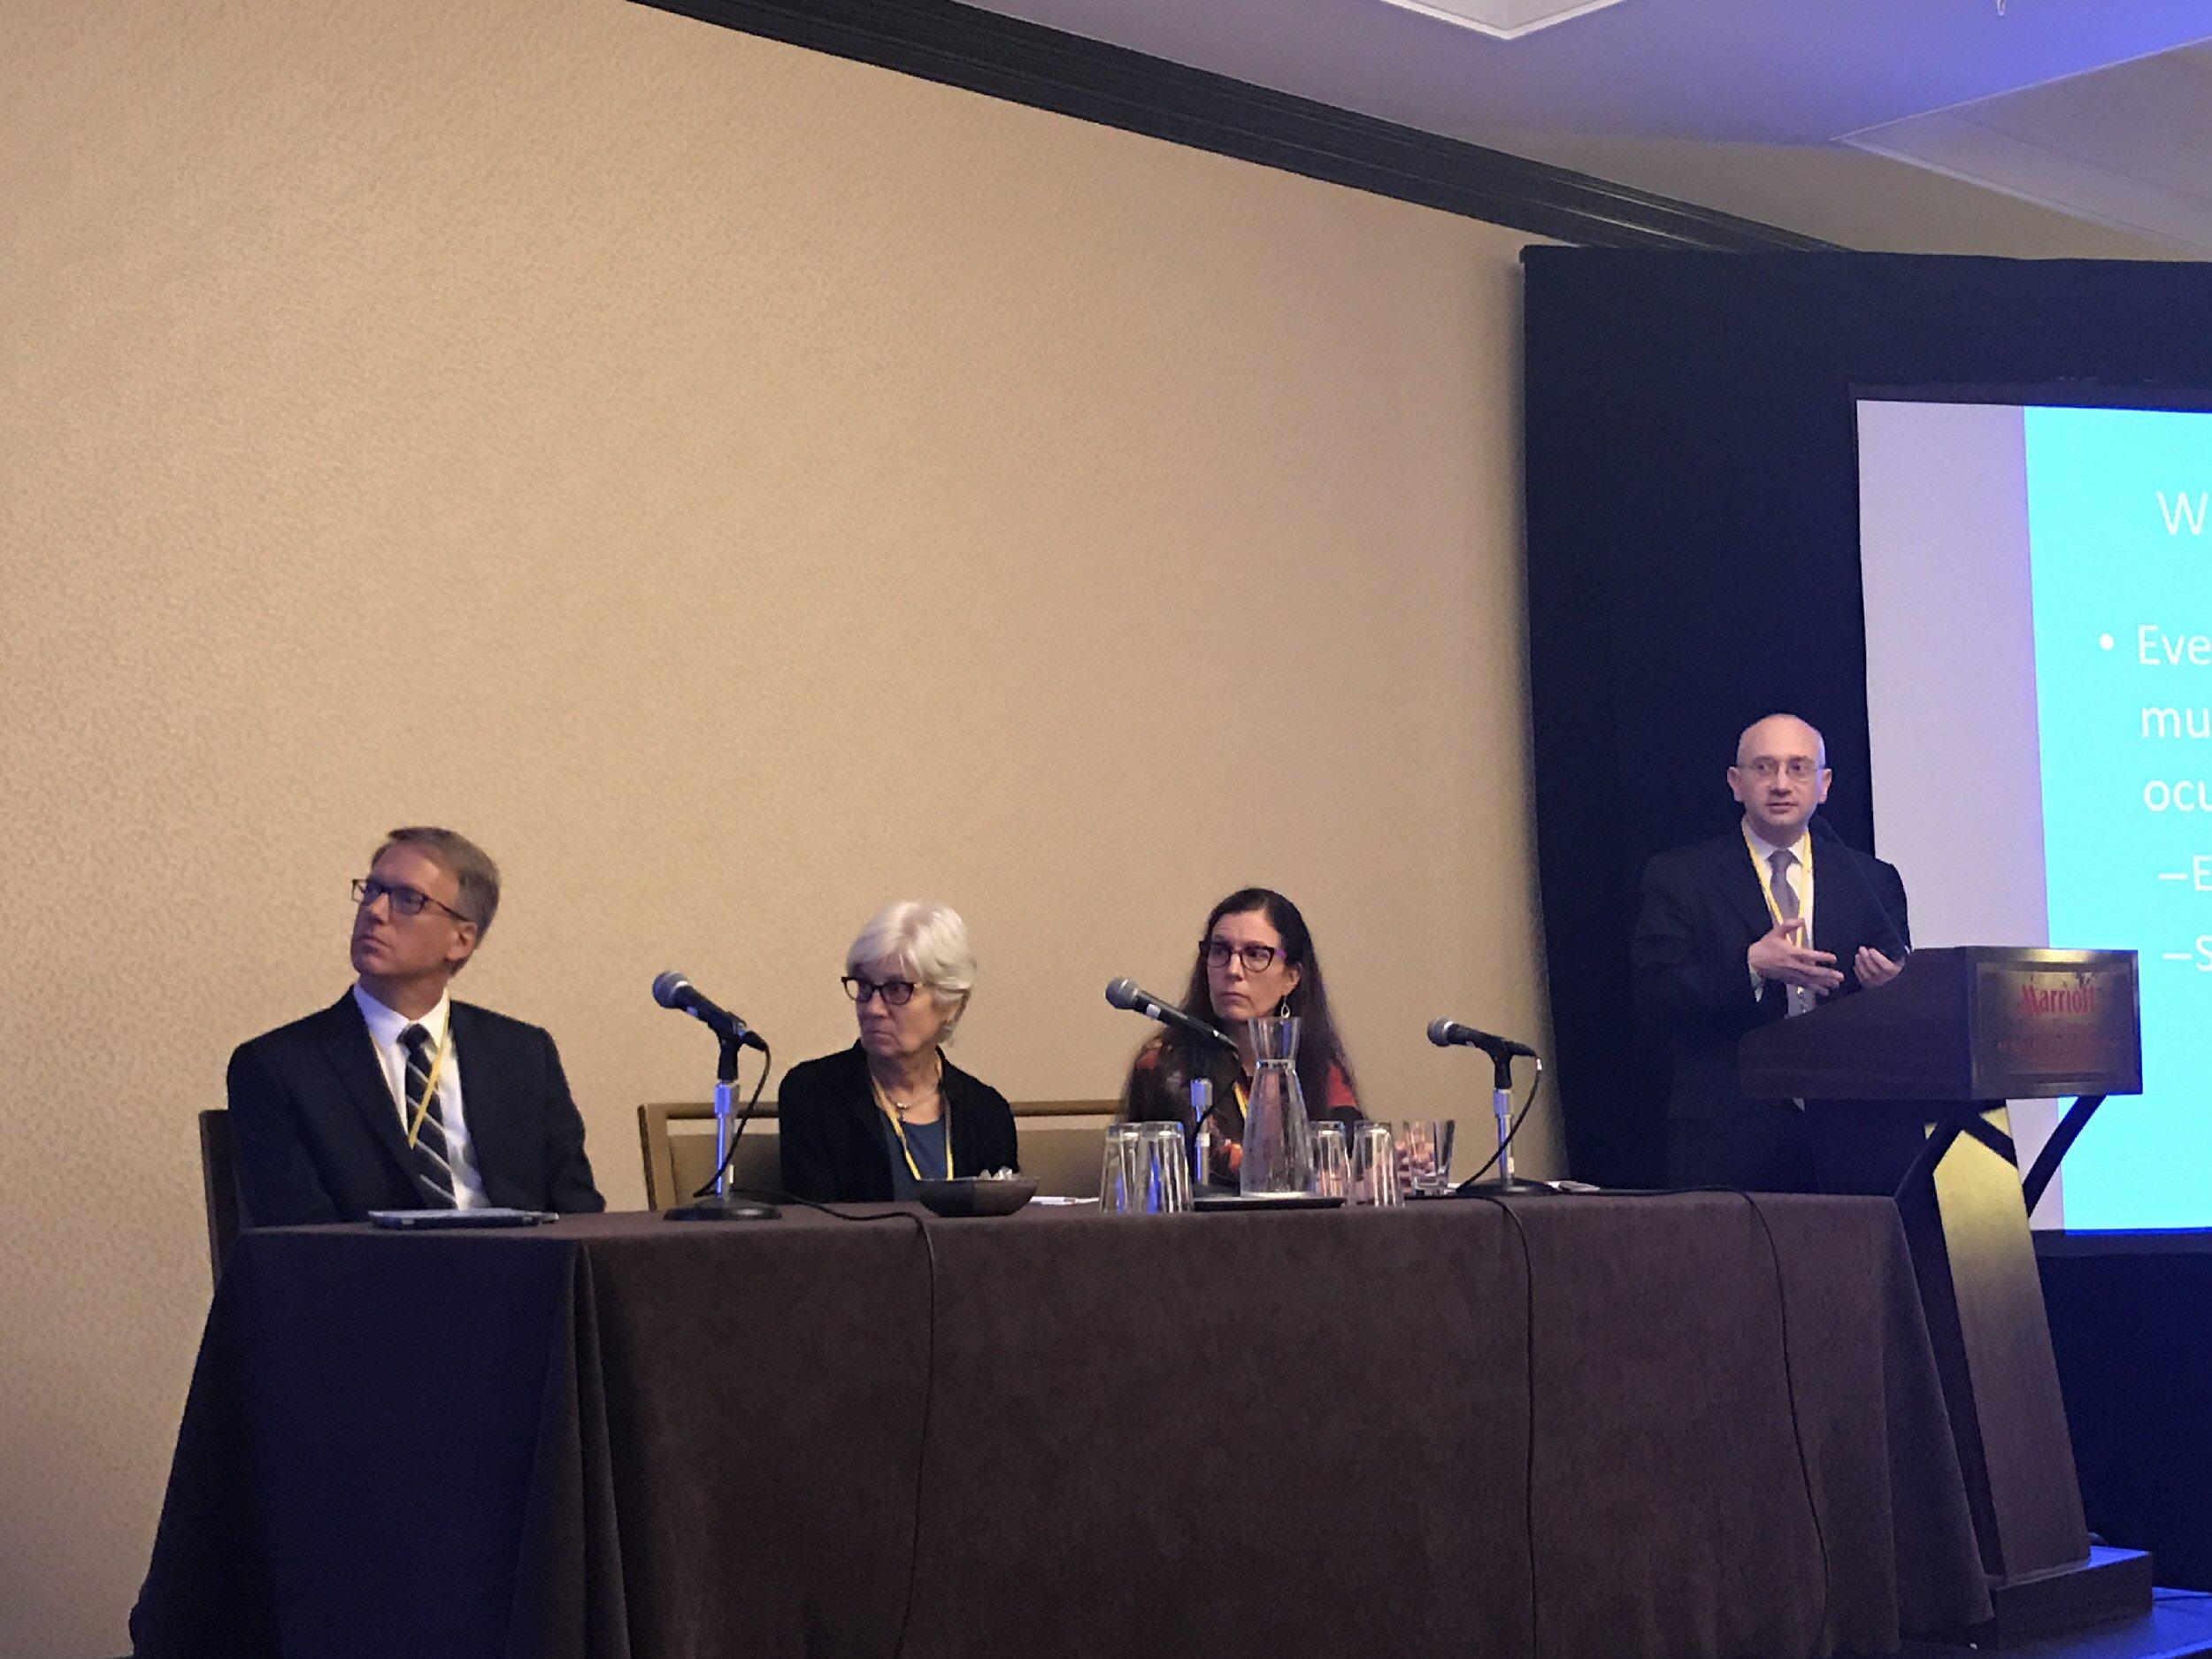 Dan Gombos introduces his Survivorship Panel, David Freyer, Ruth Kleinerman and Katherine Paton.